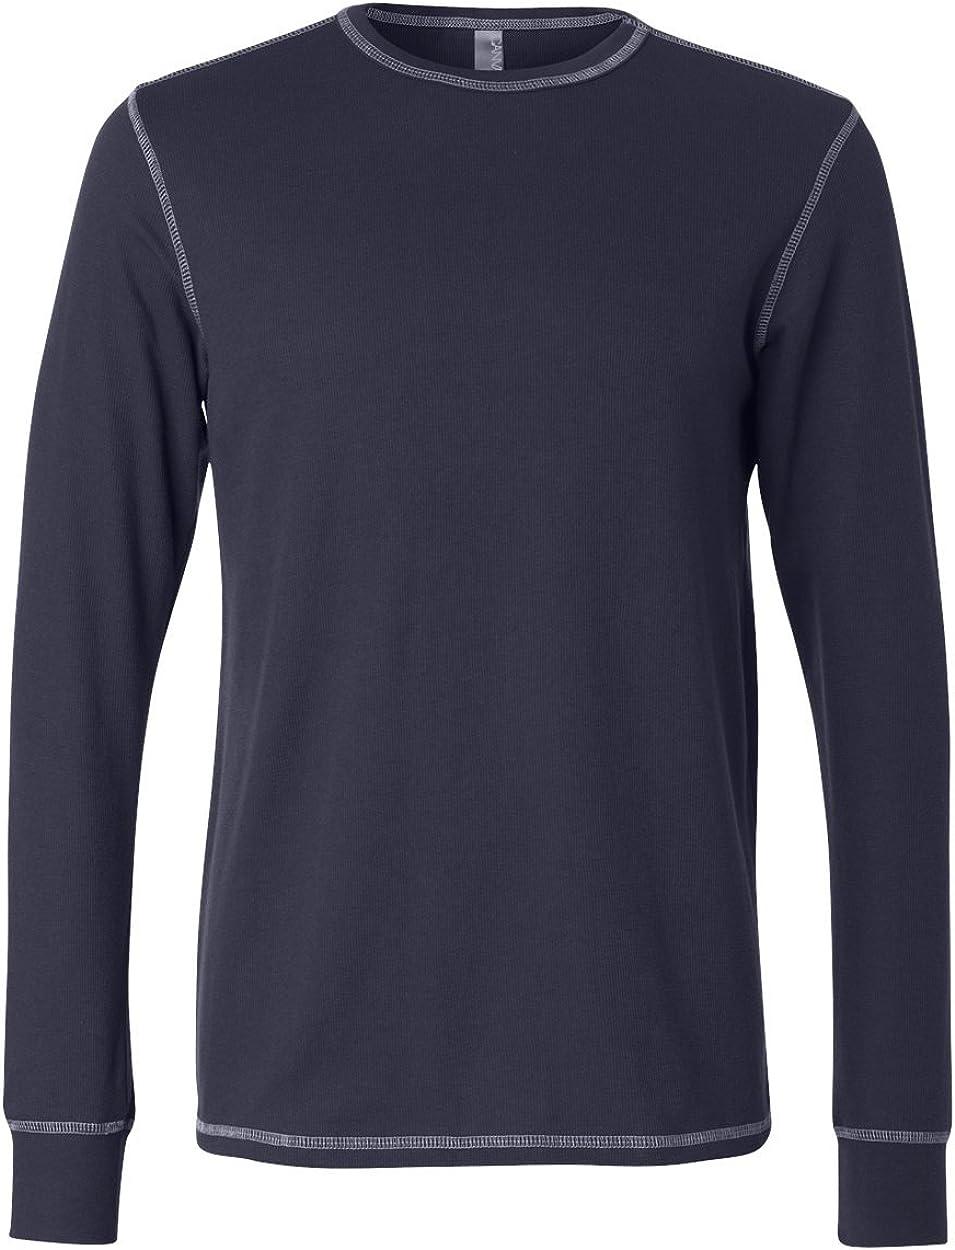 Bella Canvas Mens 4.5 oz. Long-Sleeve Thermal (3500) Navy/Grey s